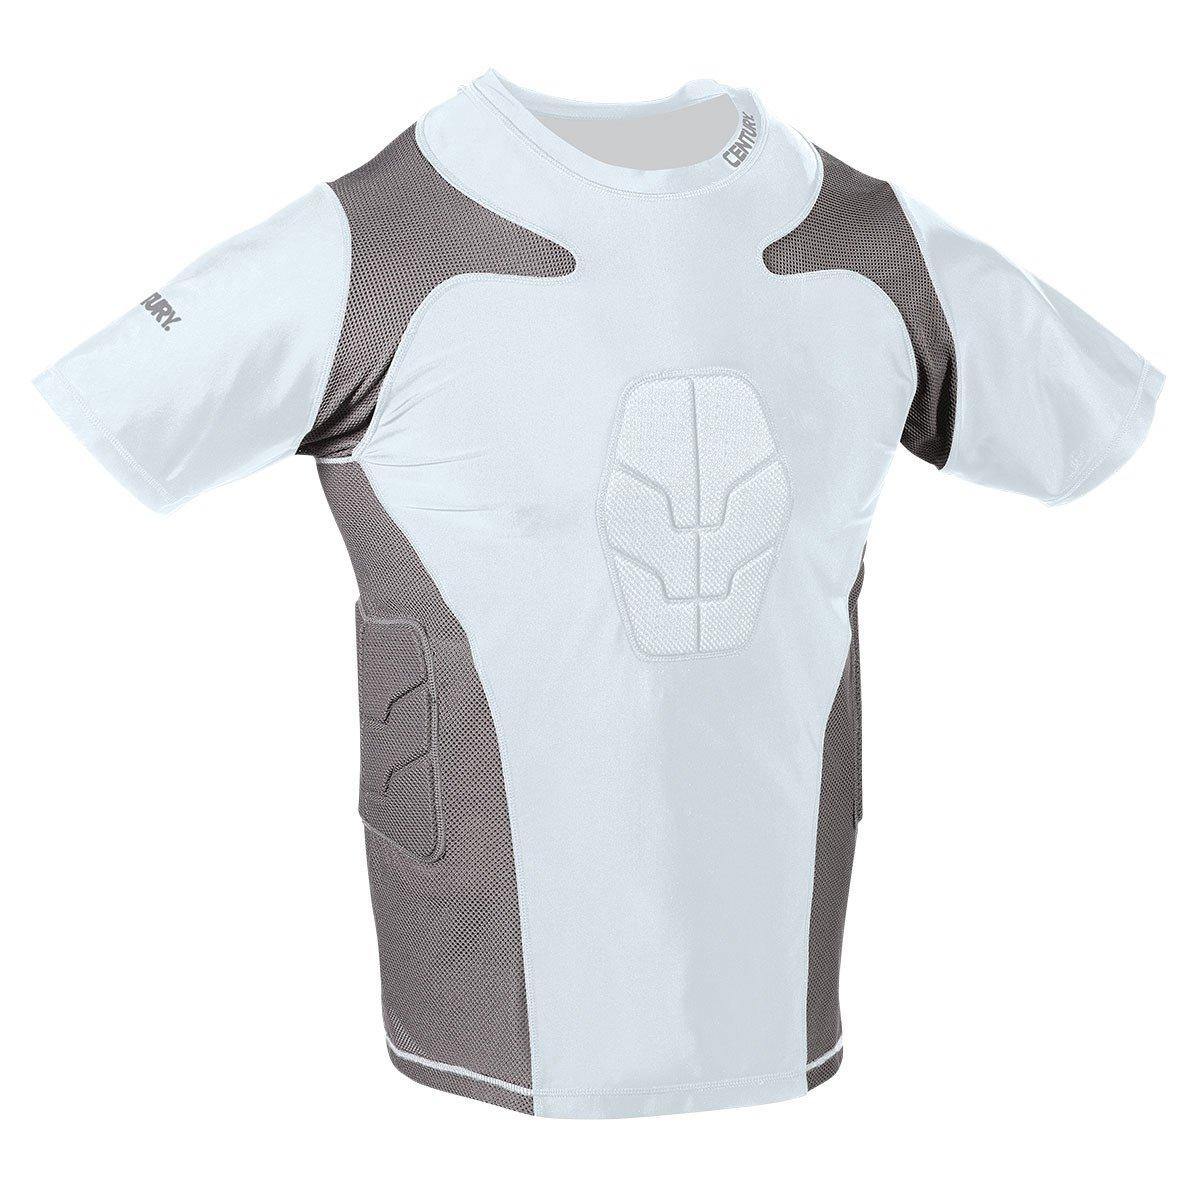 Century® Kids' Short Sleeve Padded Compression Shirt